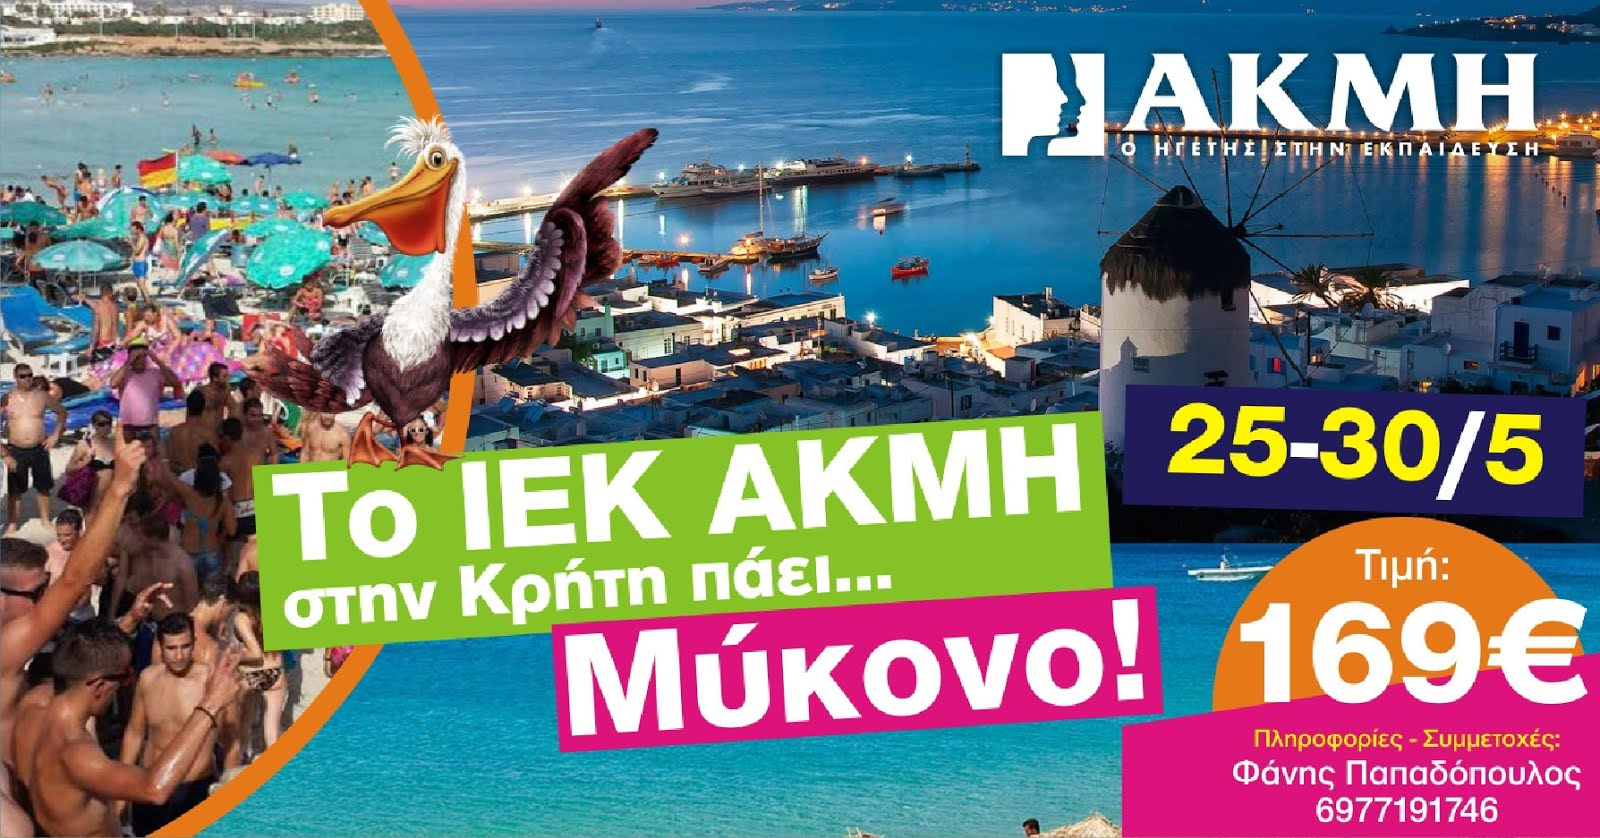 To IEK AKMH στην Κρήτη πάει... Μύκονο!